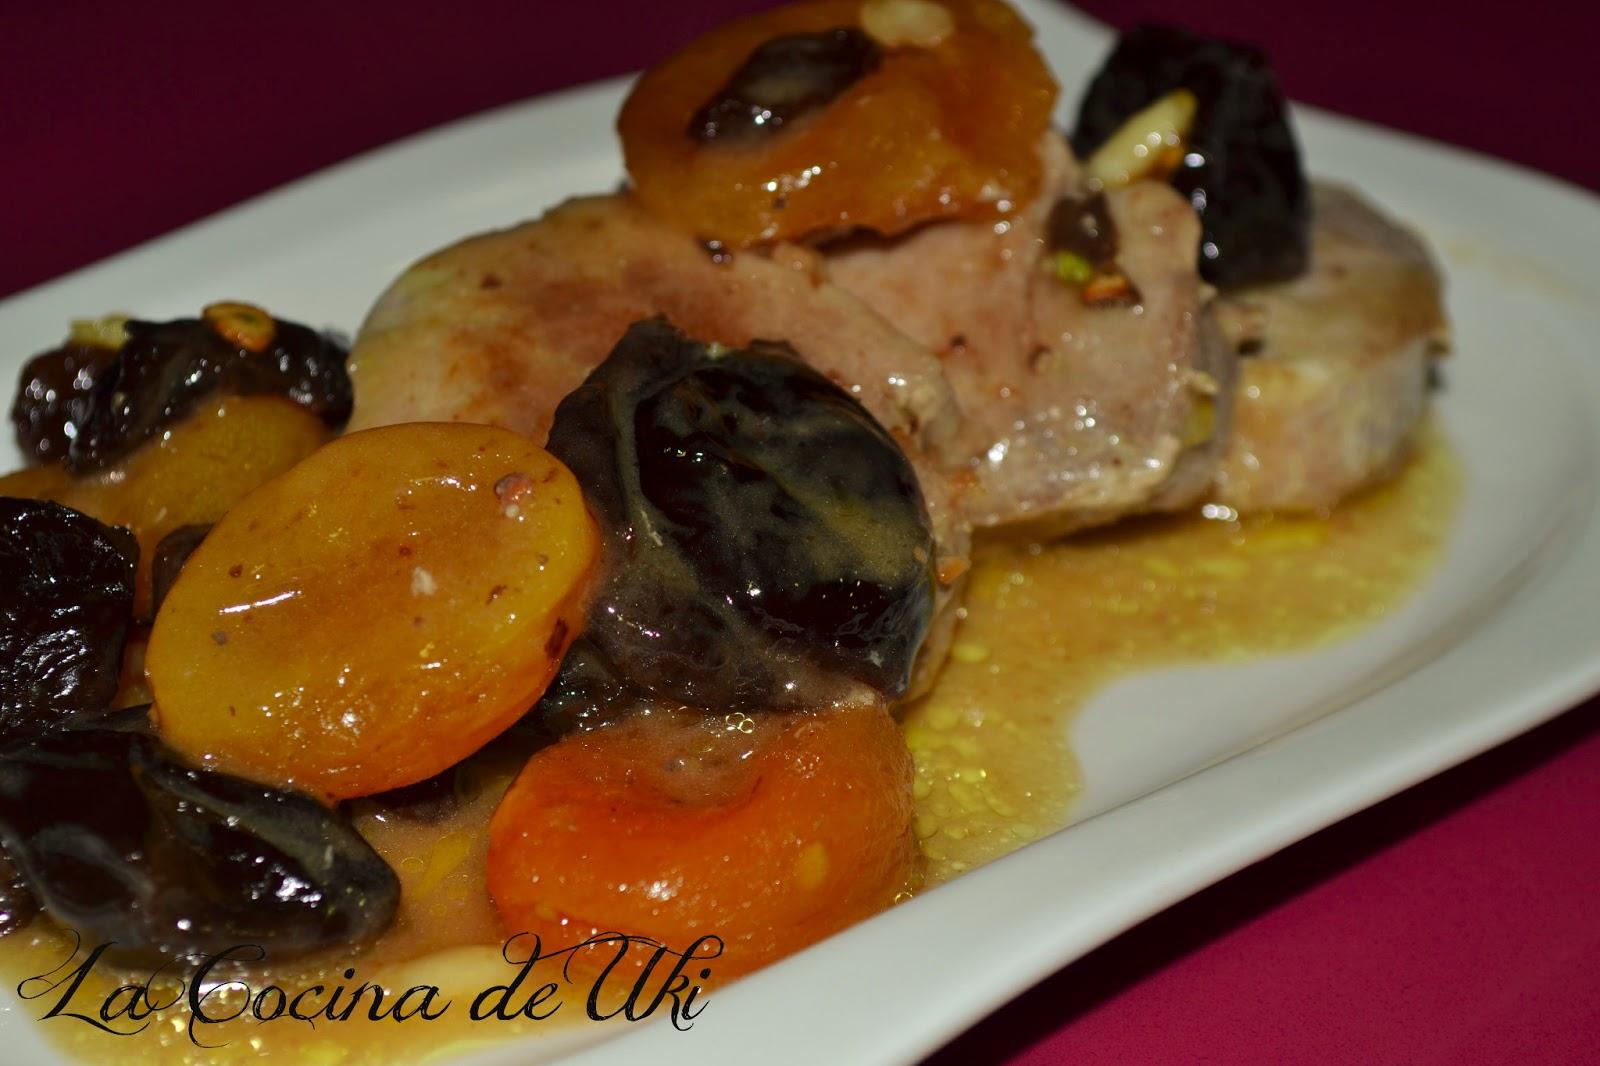 La cocina de uki solomillo ib rico con pasas al pedro ximenez Solomillo iberico al horno